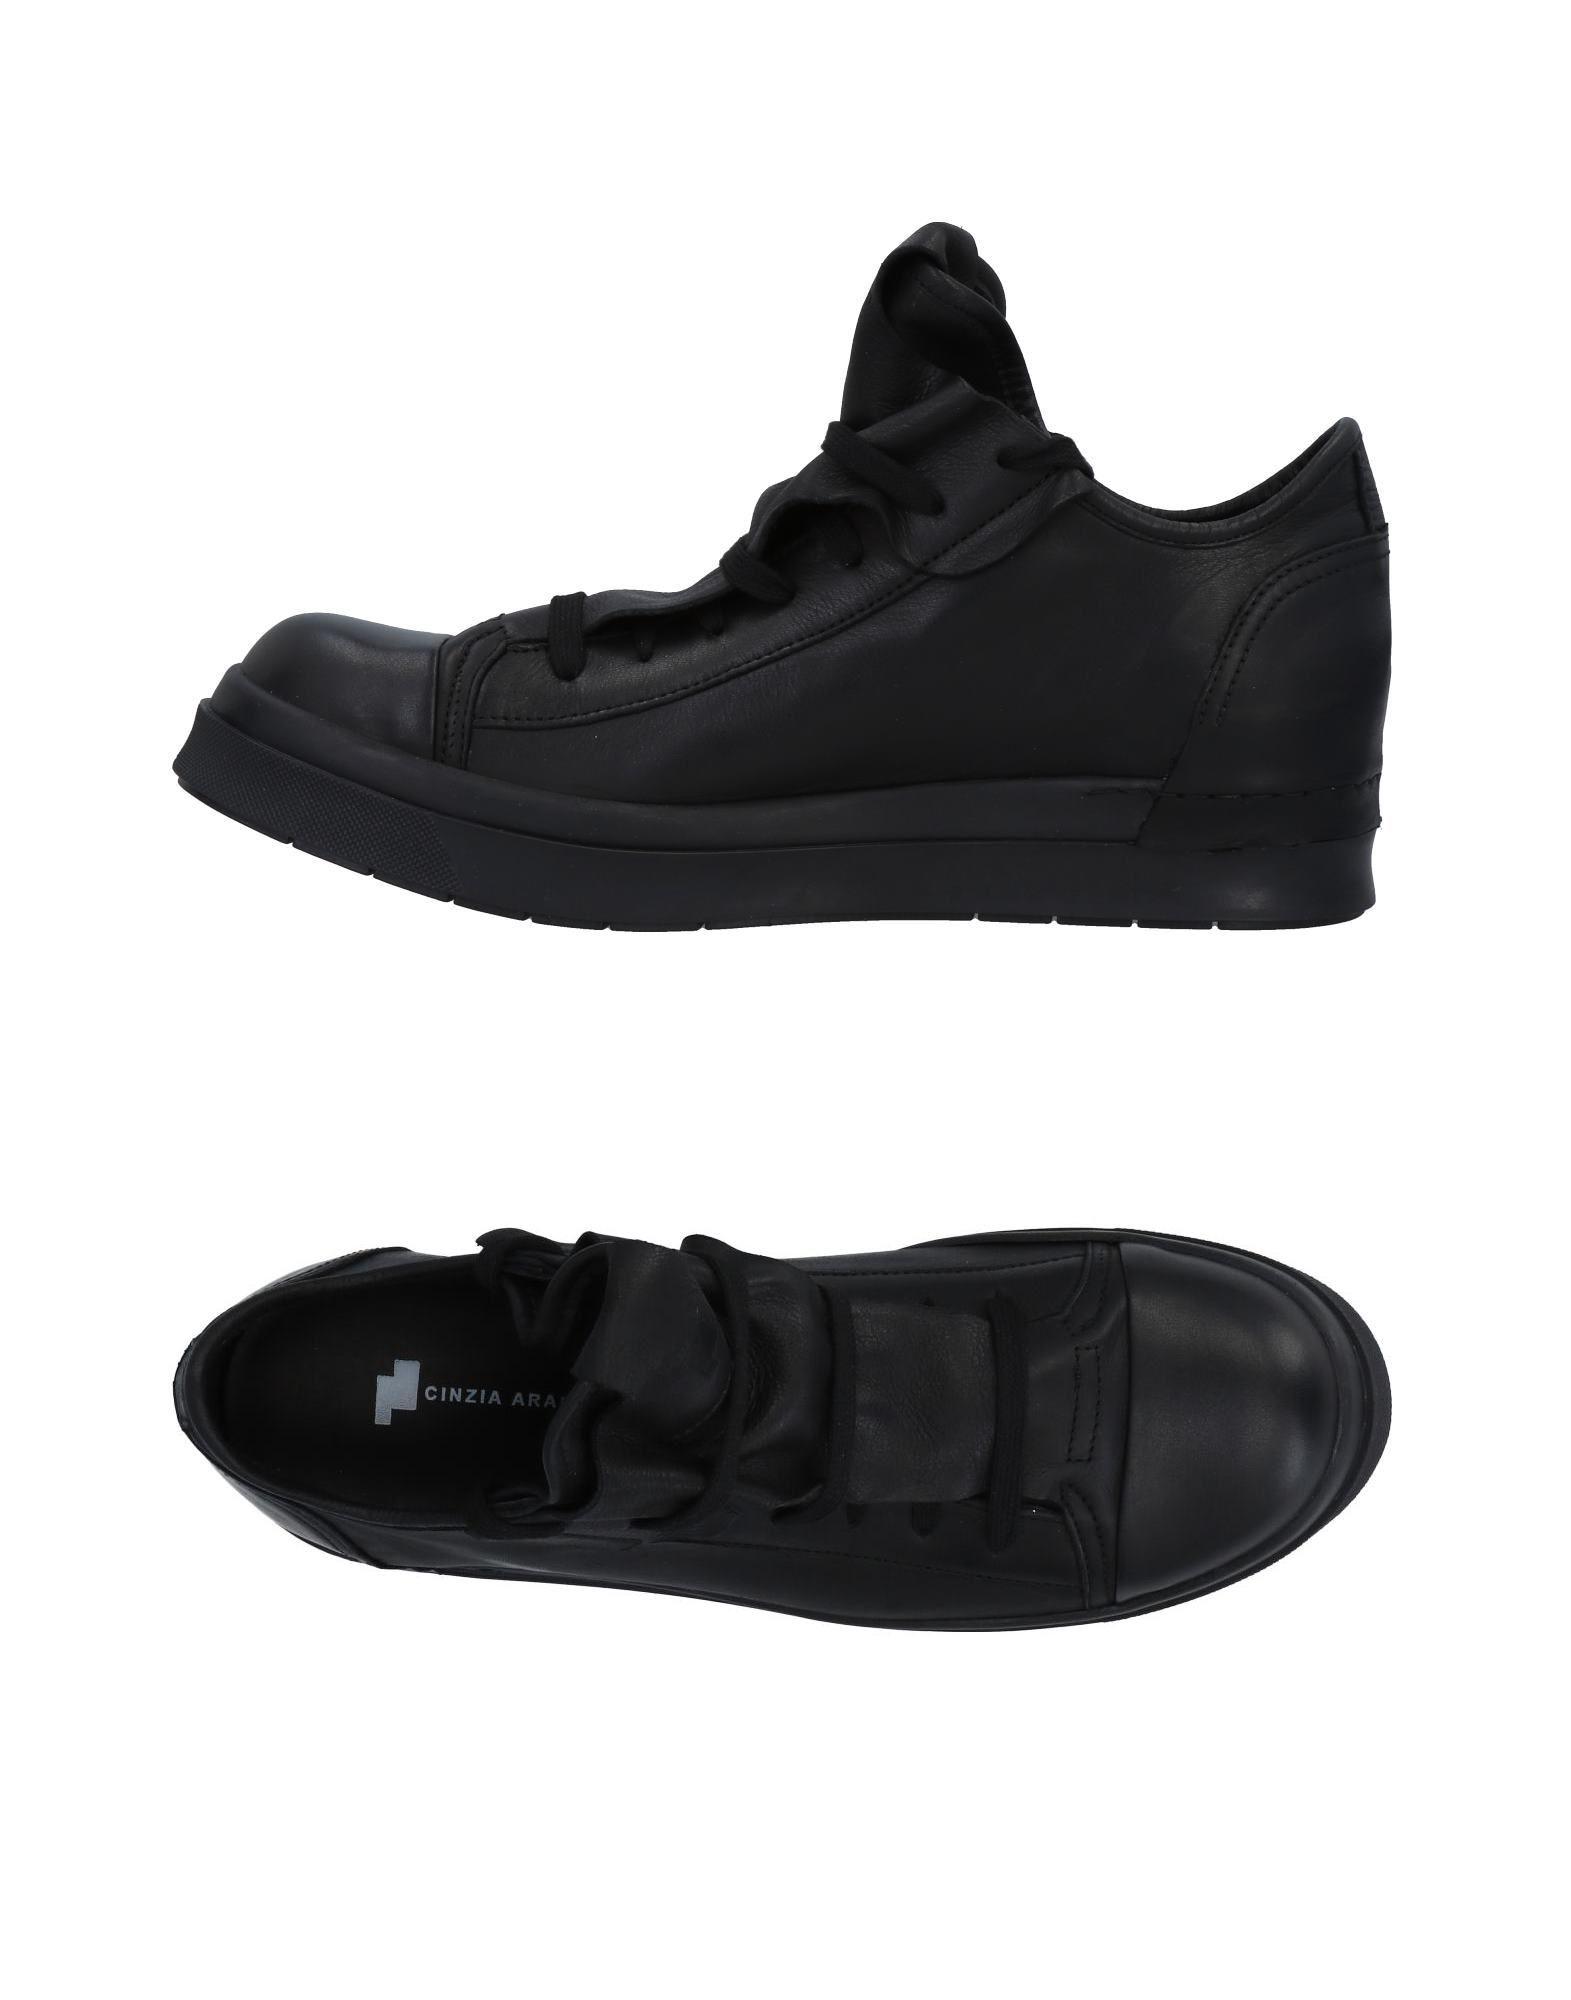 Cinzia Araia Sneakers Herren  11493845CS Gute Qualität beliebte Schuhe